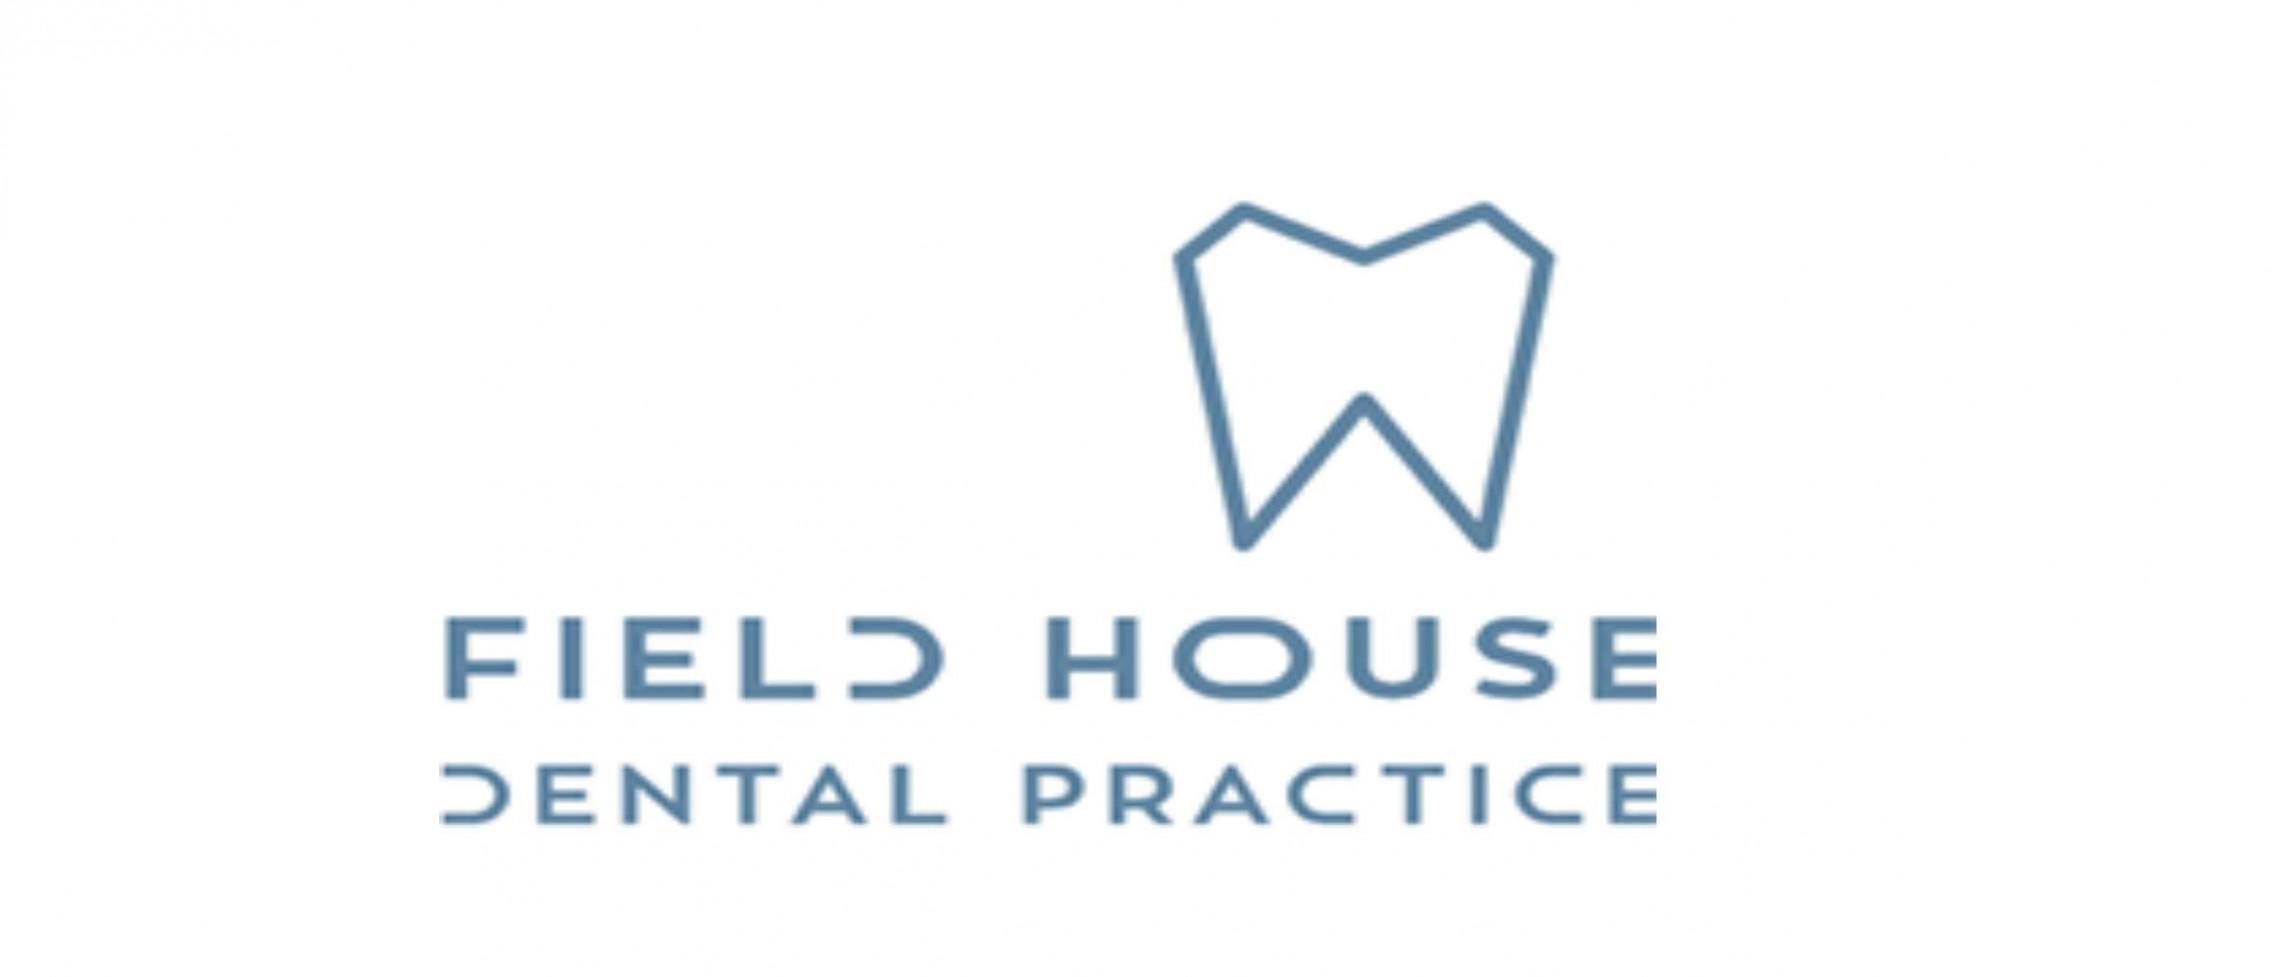 Field House Dental Practice